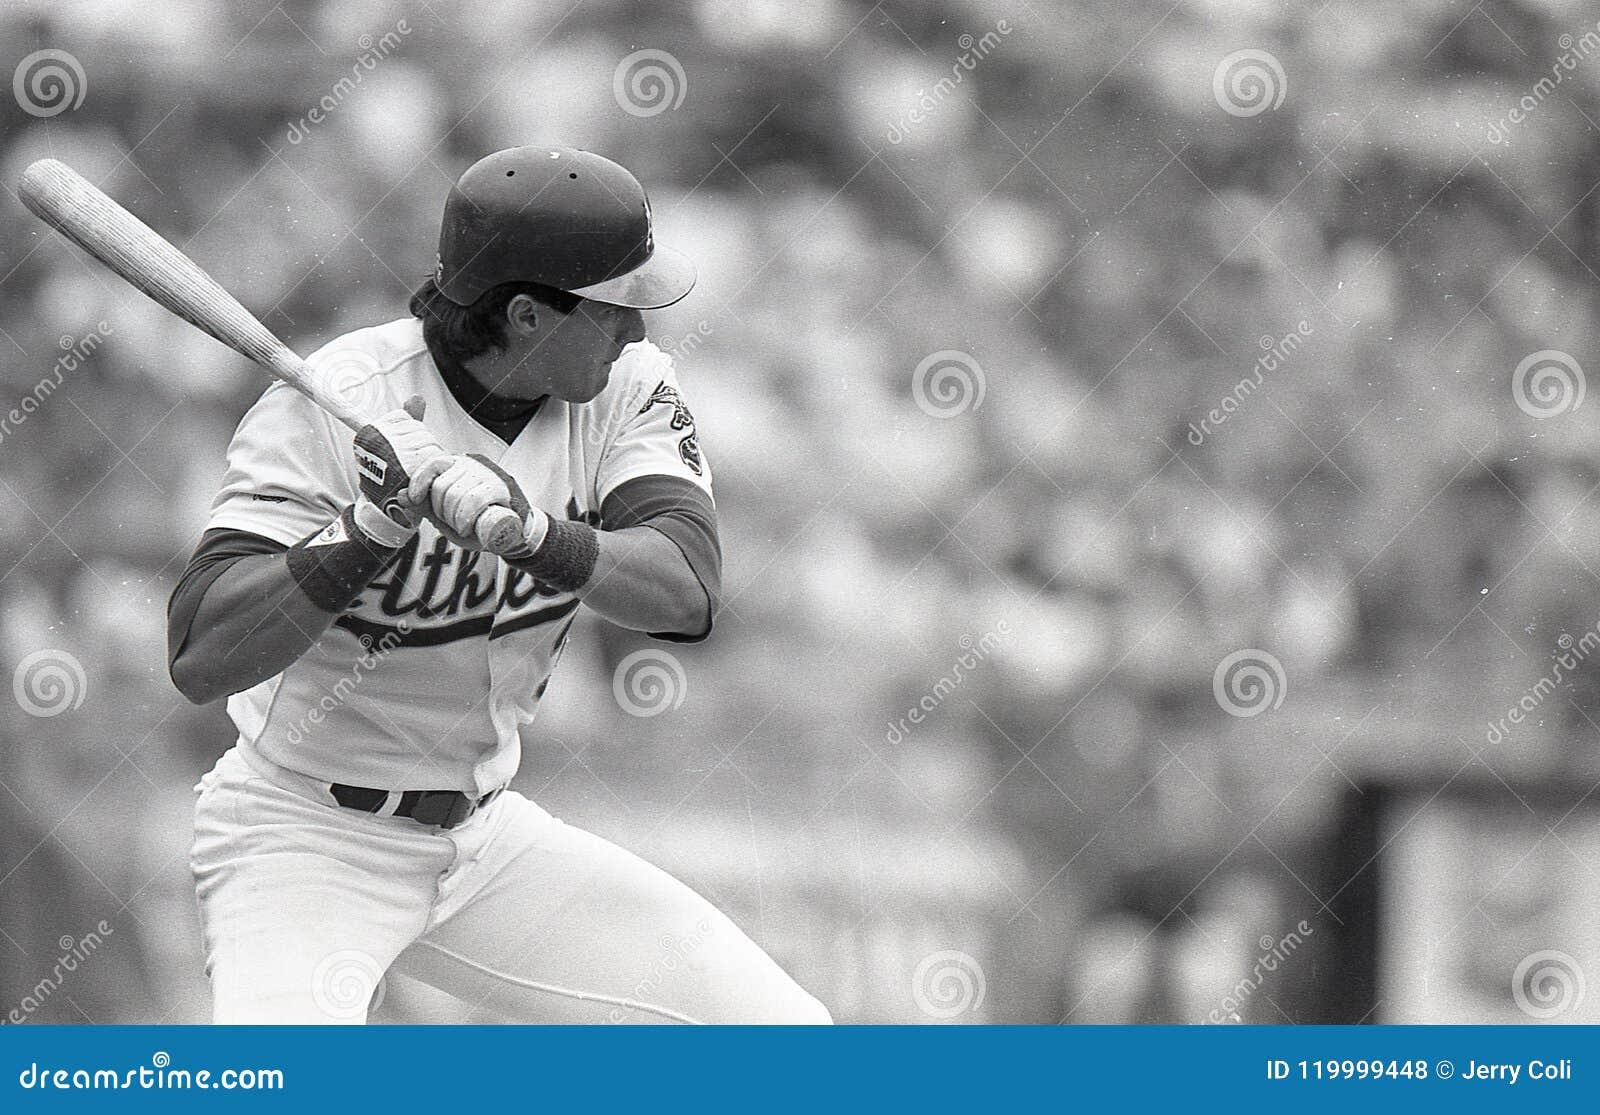 Oakland Athleticsslugger Jose Canseco